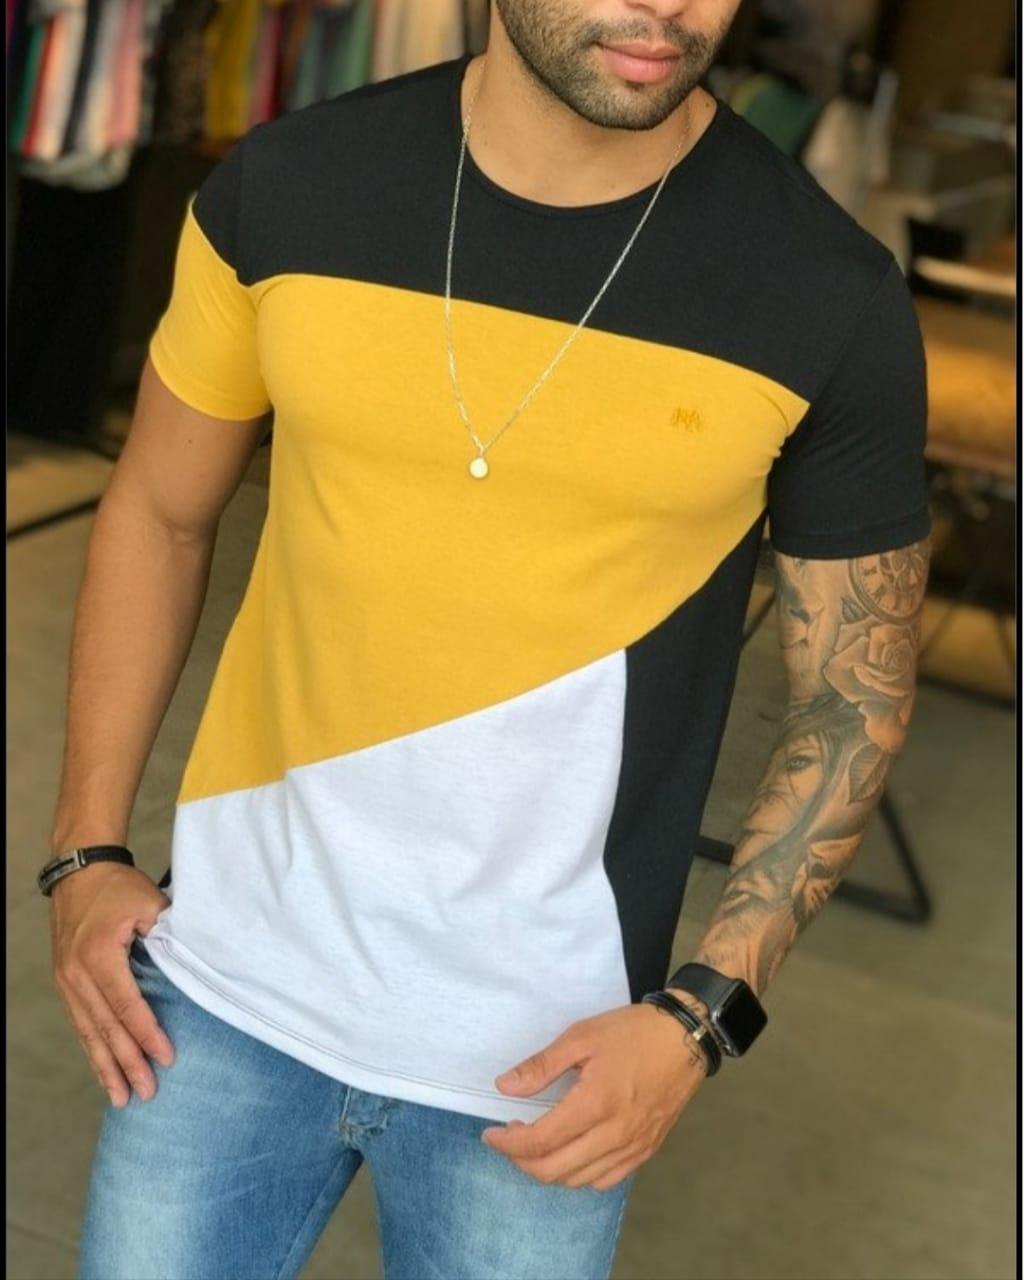 Camiseta M Artt Preta Detalhes Amarelo e Branco  - Harpia Moda - Moda Masculina & Acessórios